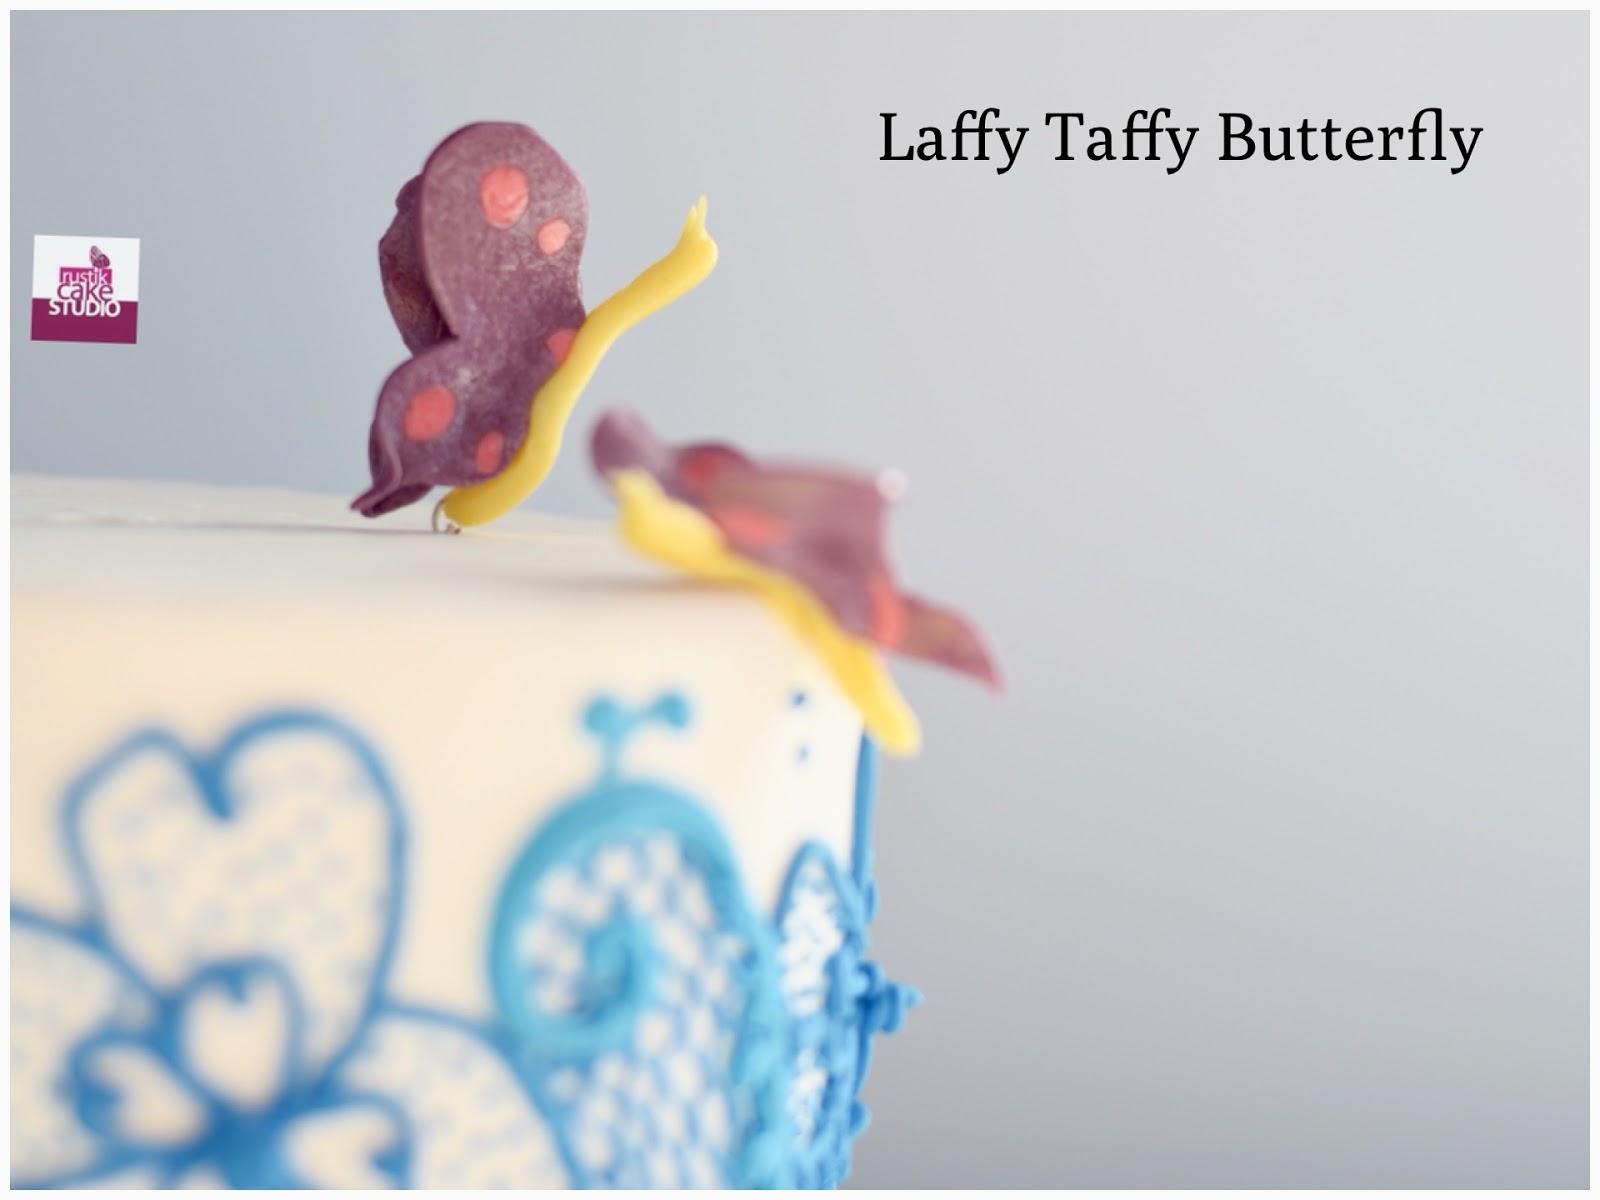 RUSTIK CAKE STUDIO: EDIBLE DECORATIONS: LAFFY TAFFY BUTTERFLY